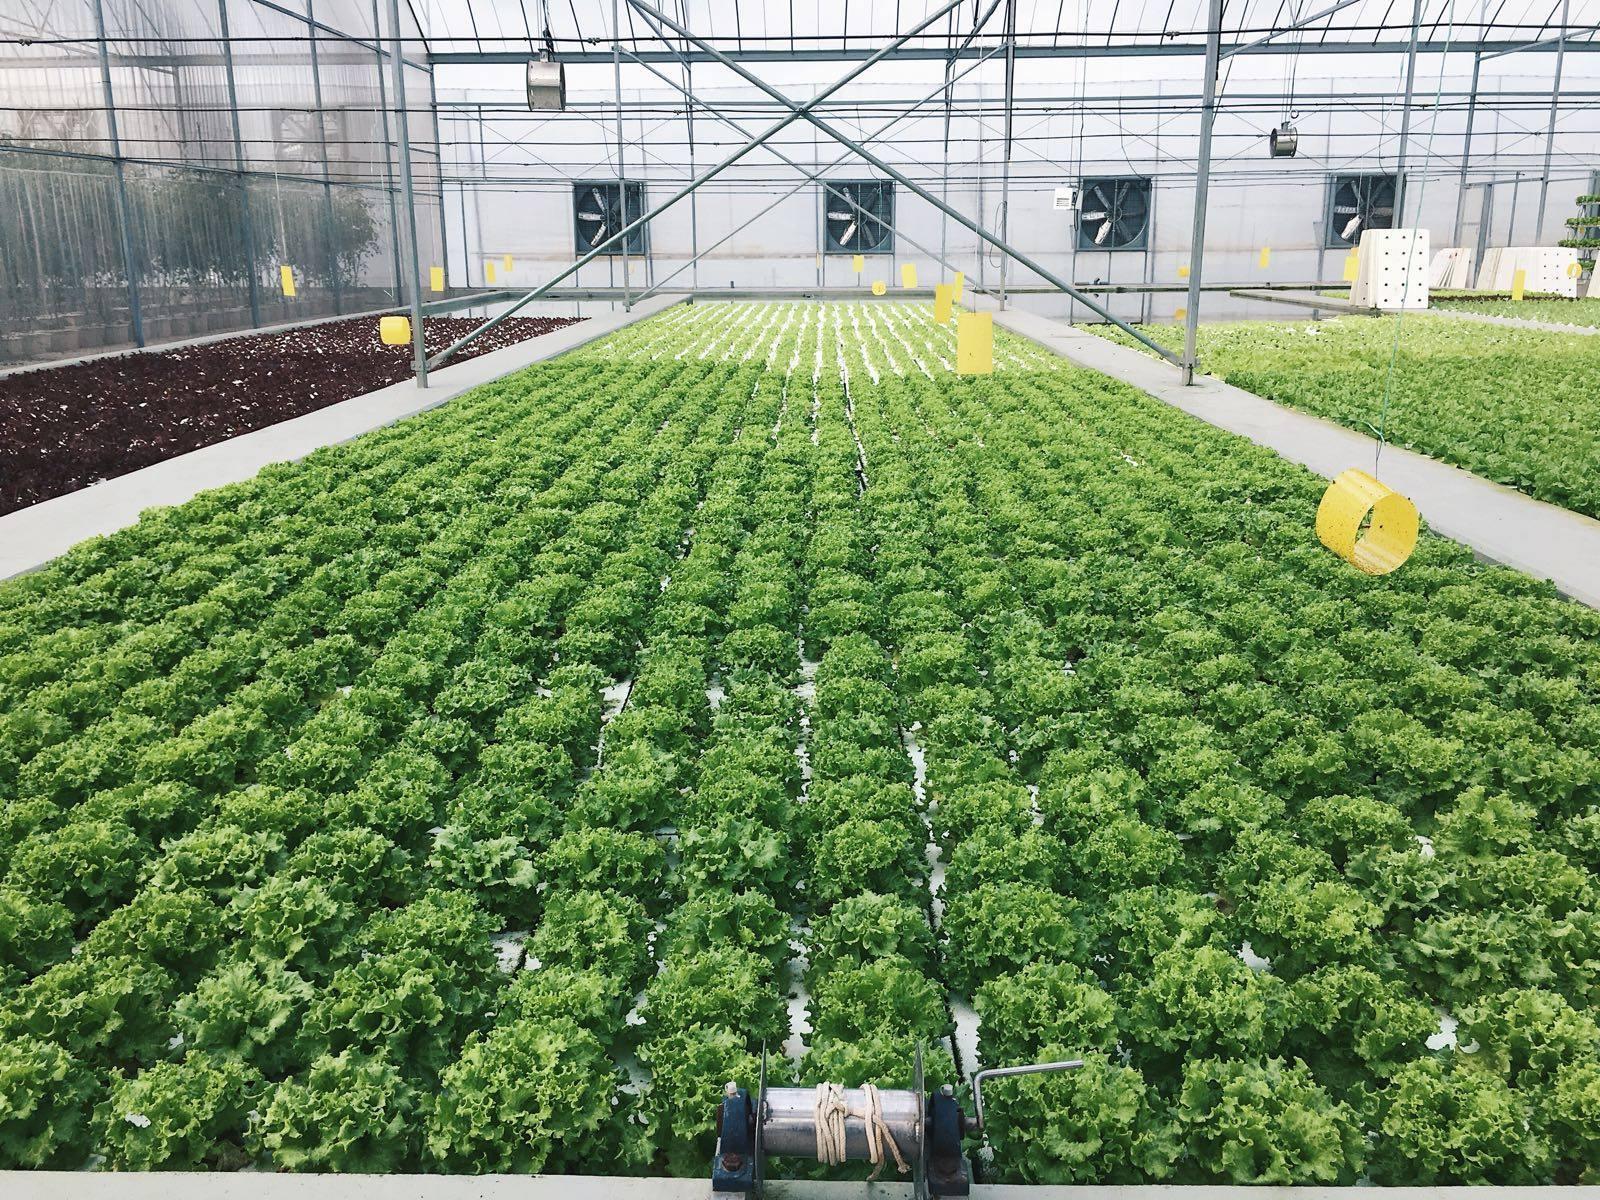 Kok Fah Technology Farm